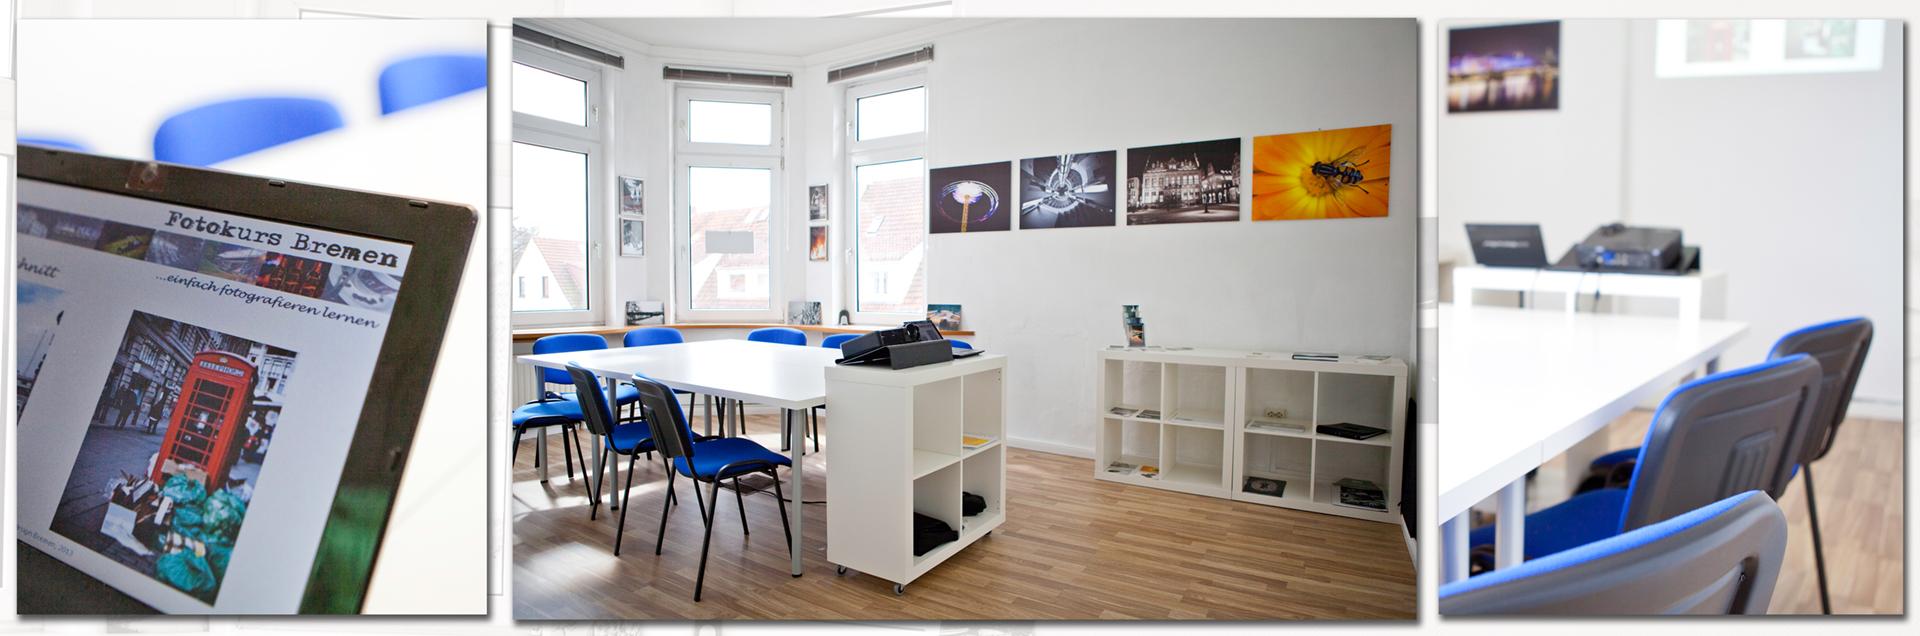 Fotokurs, Bremen, Fotoschule, Neustadt, Fotograf